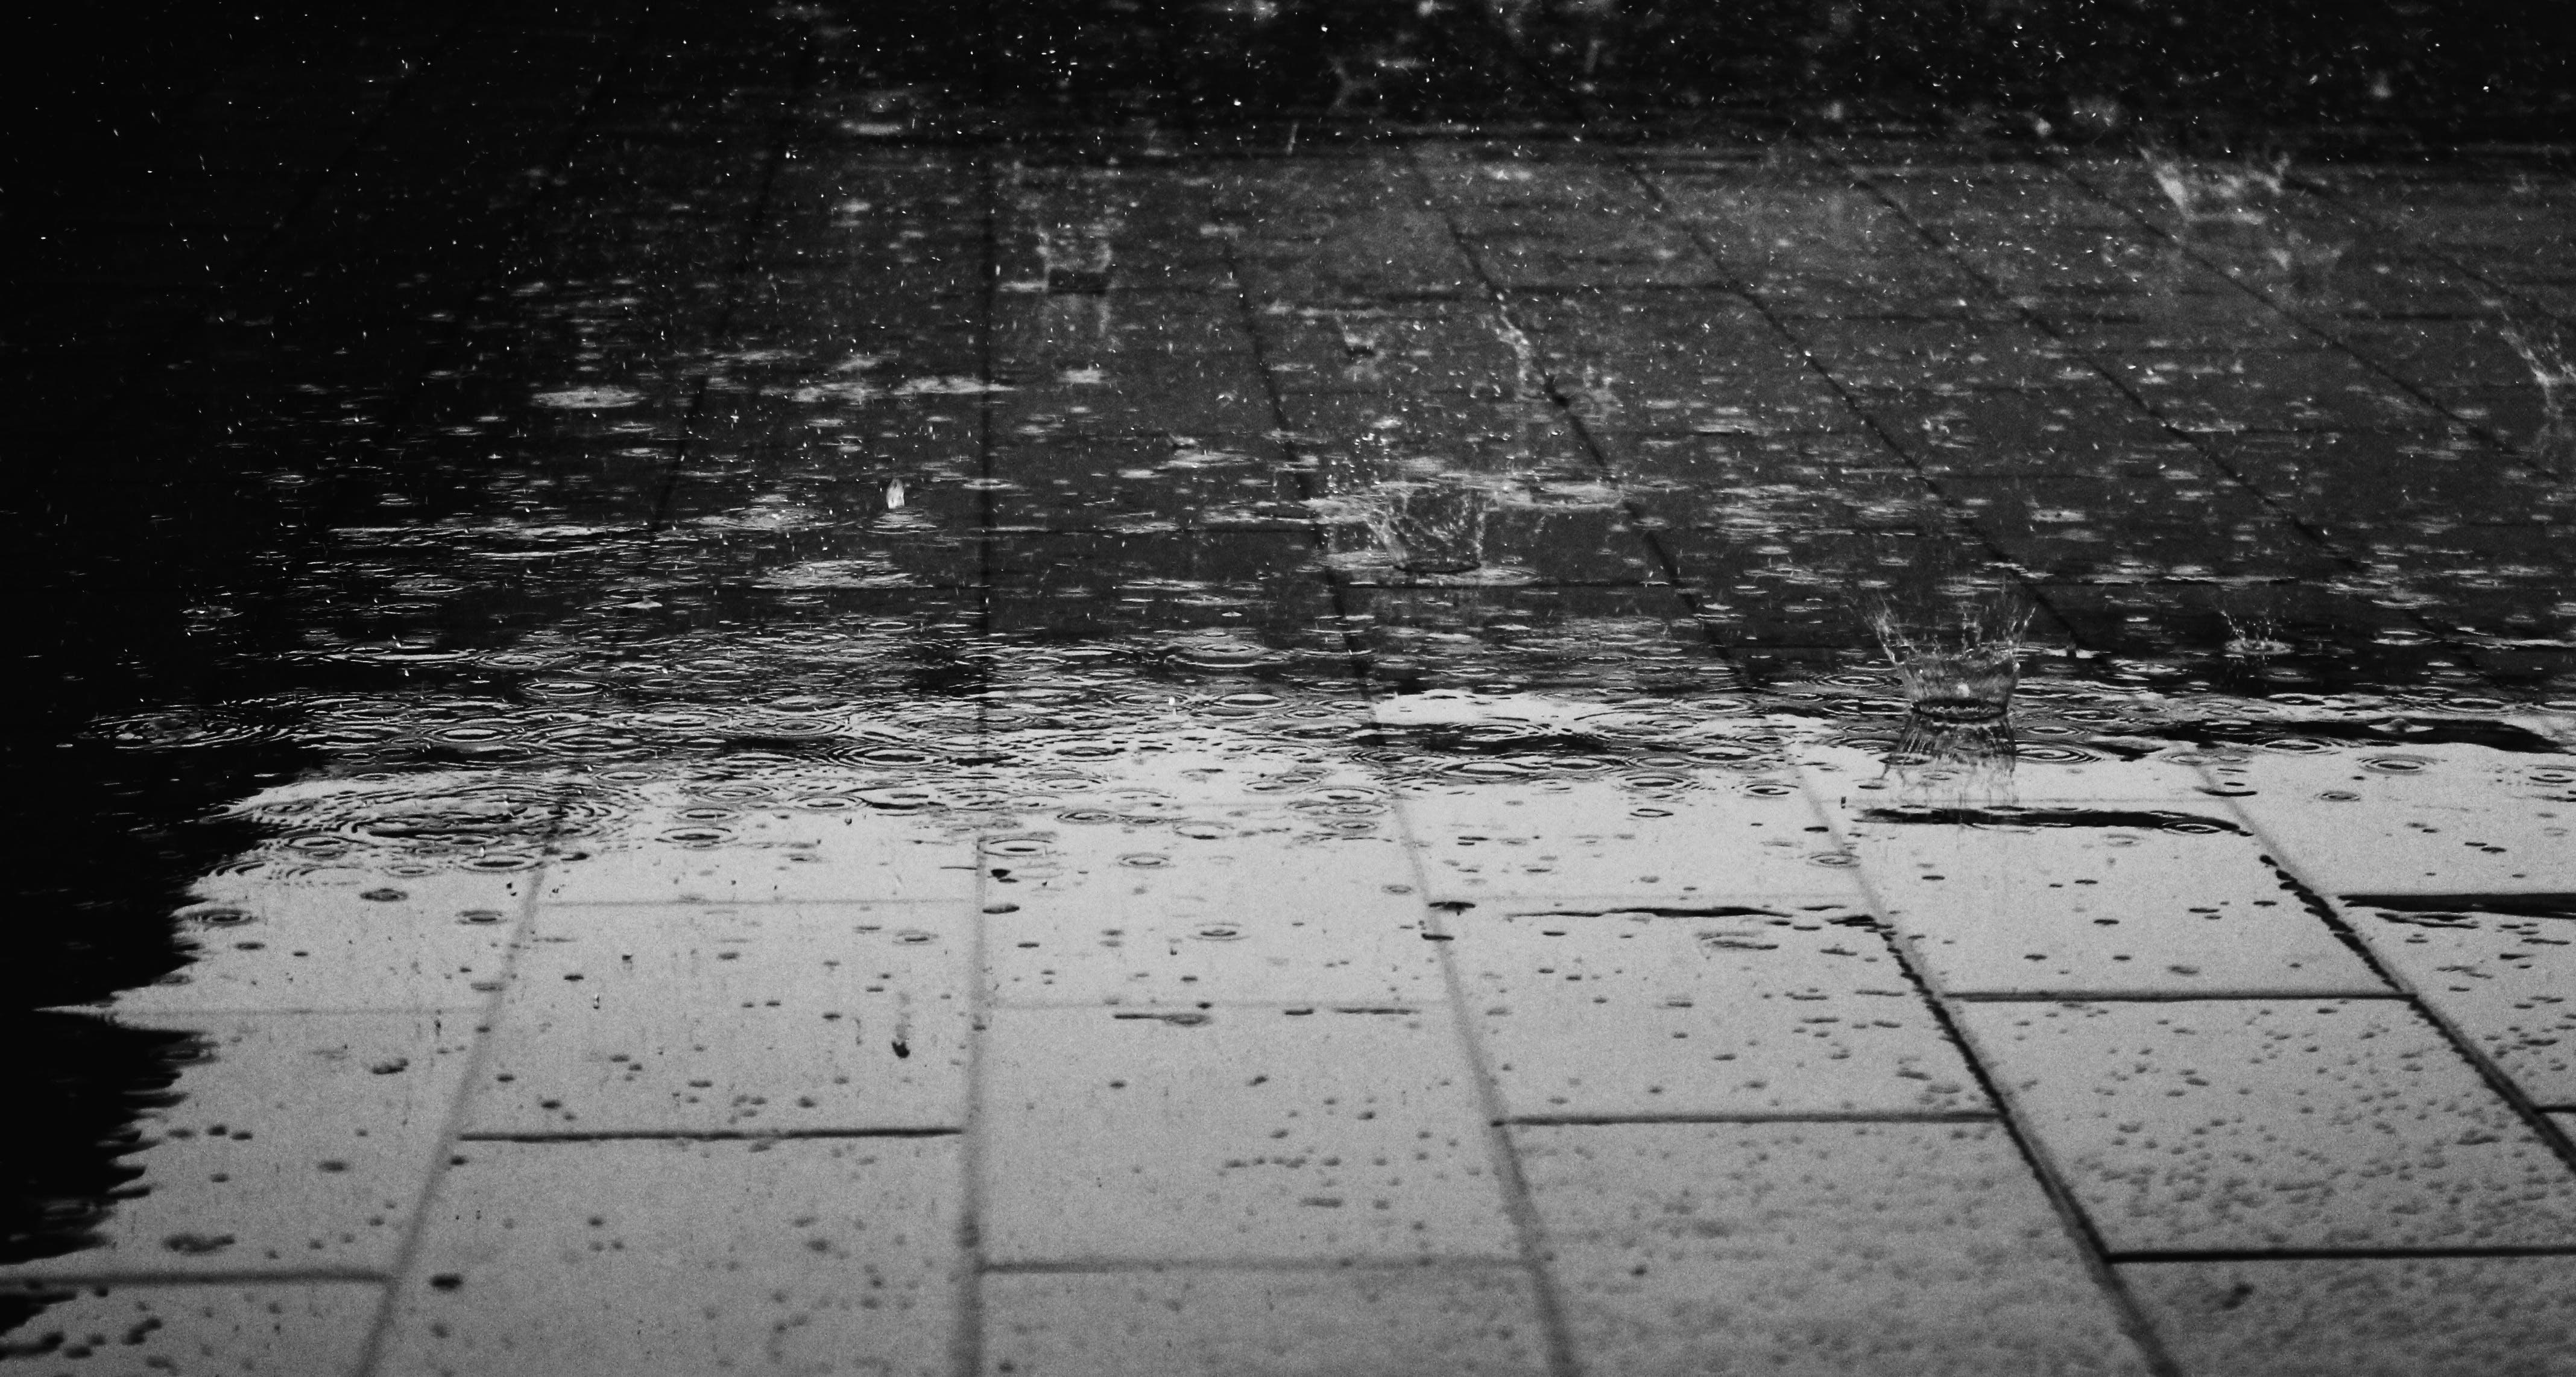 Greyscale Photo of Rain Drops